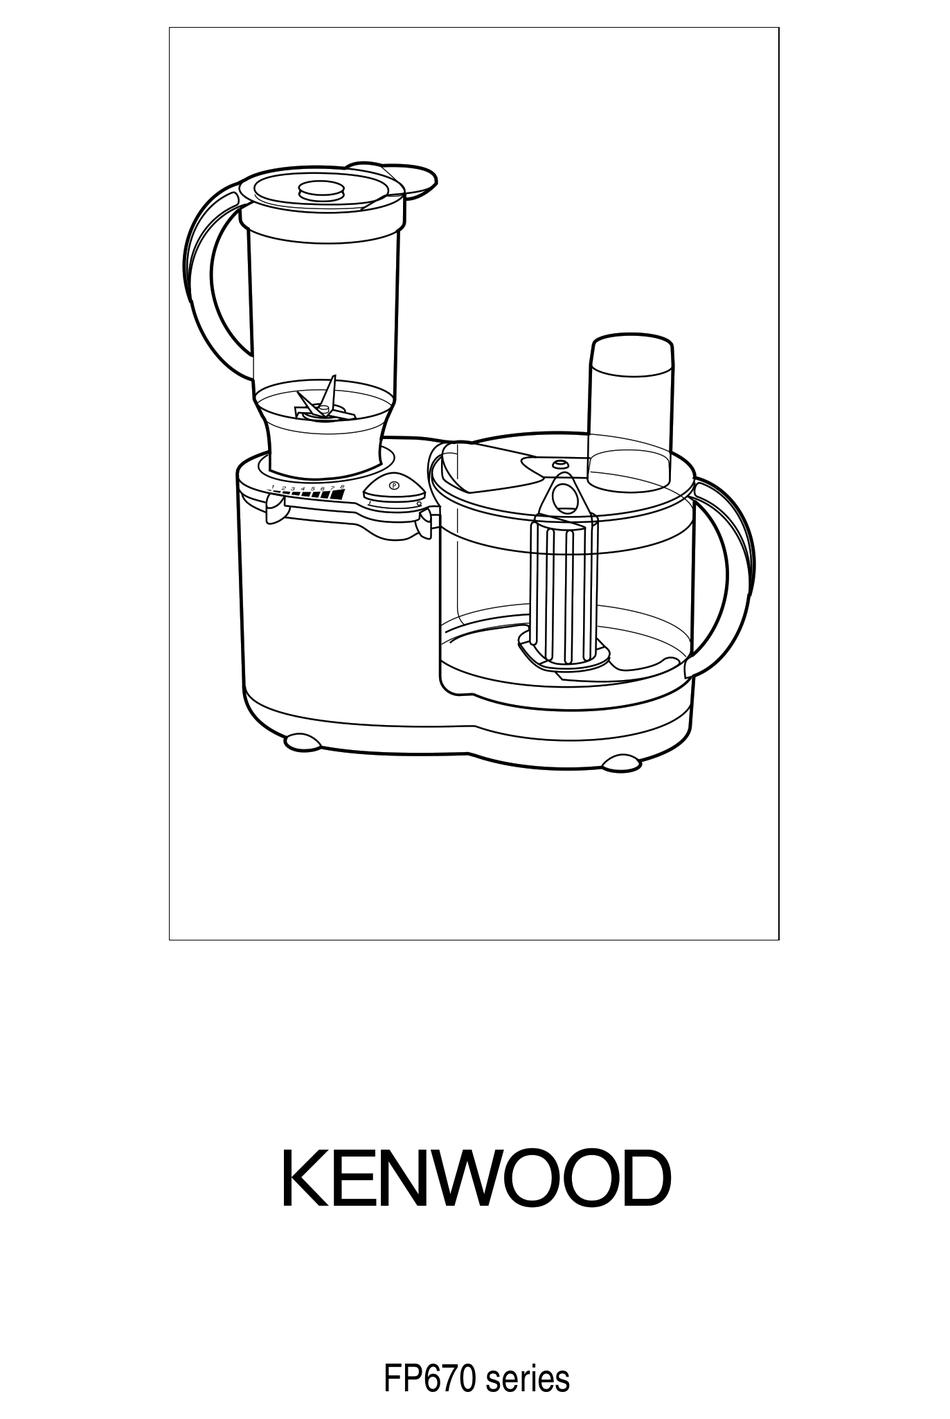 KENWOOD FP670 SERIES INSTRUCTIONS MANUAL Pdf Download